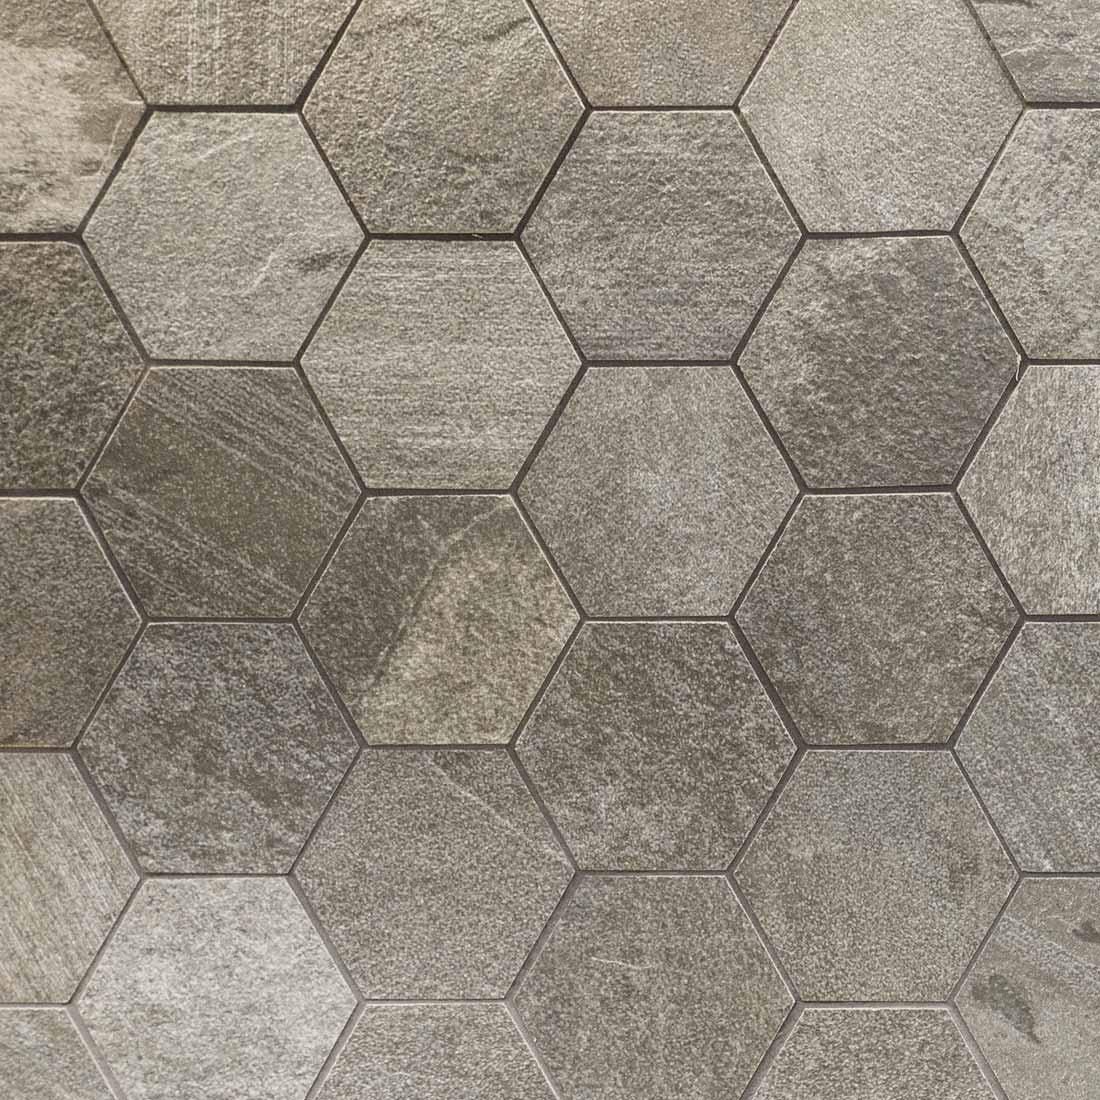 Texture carrelage en polygone gris beige